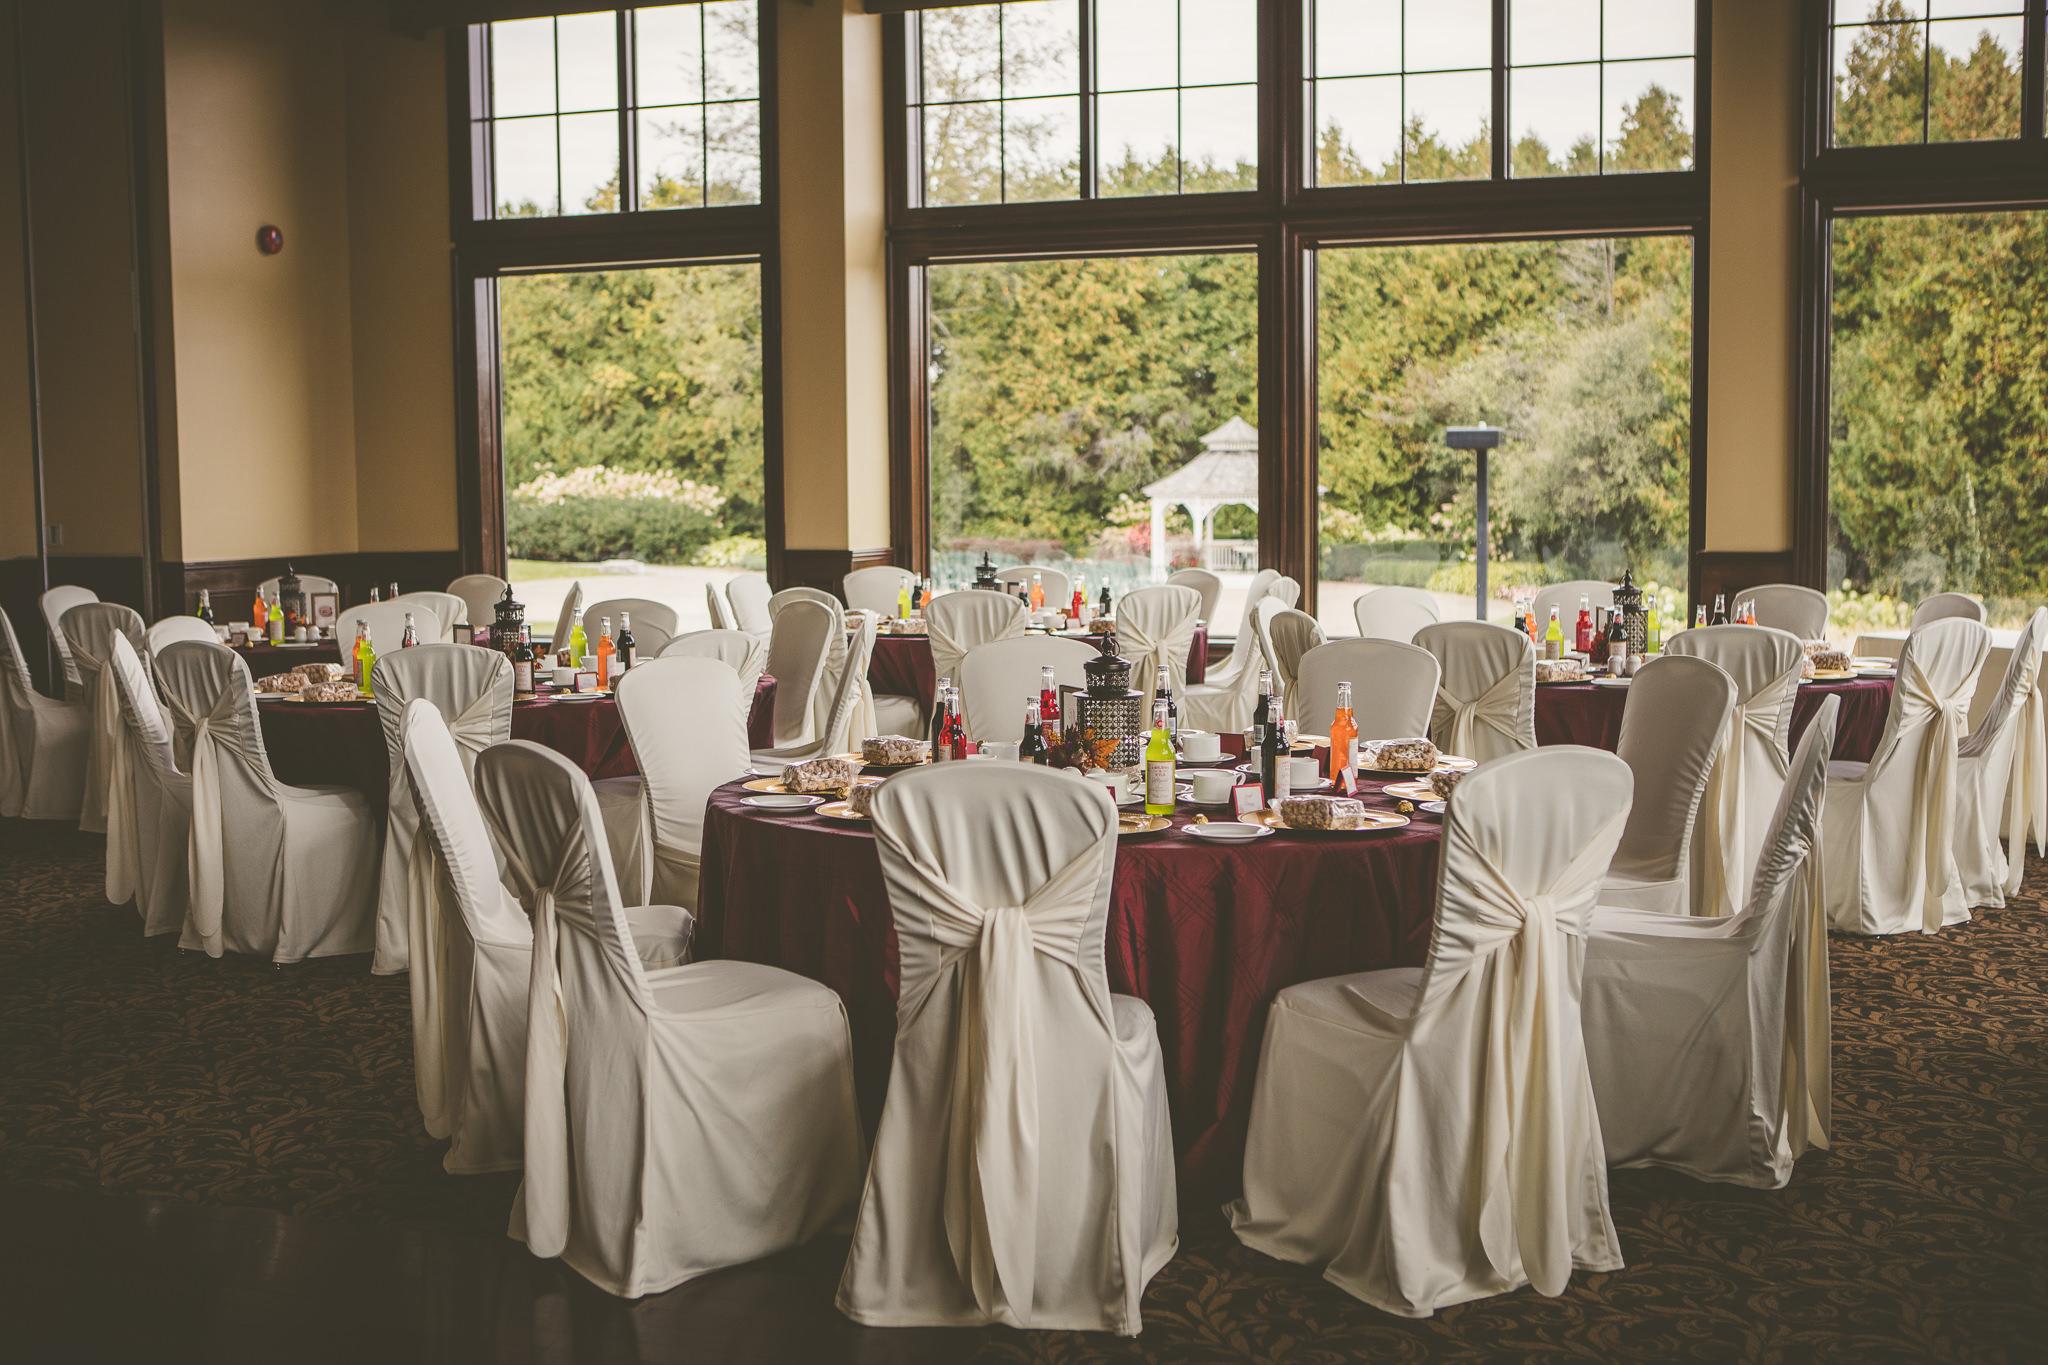 deer creek banquet facility wedding photos 418 - Deer Creek Wedding Photos